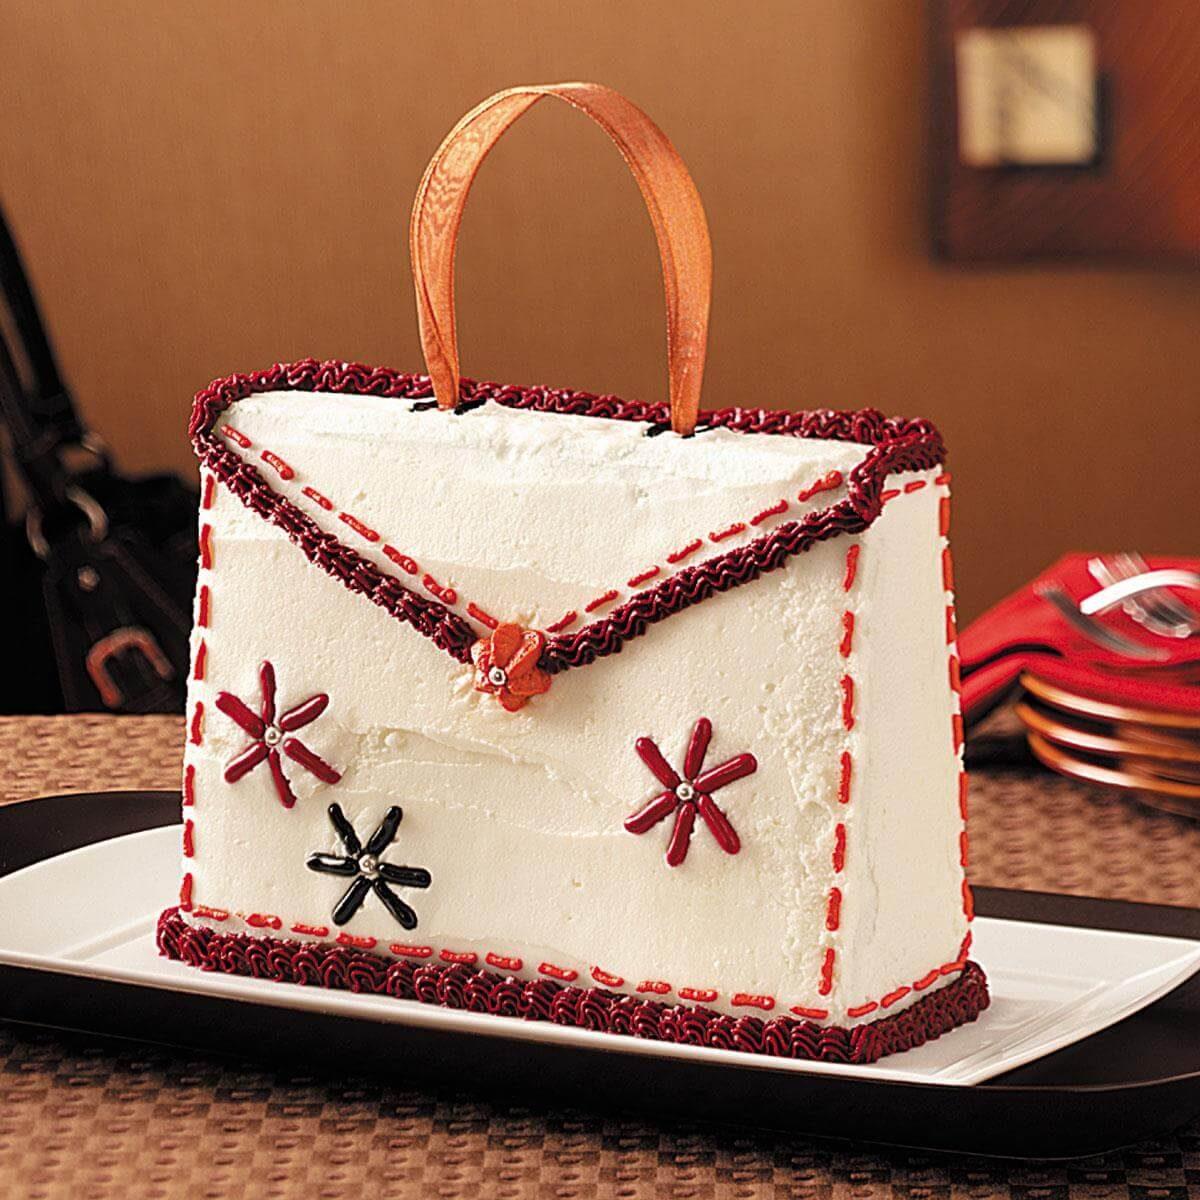 Purse Cake Recipe Taste Of Home